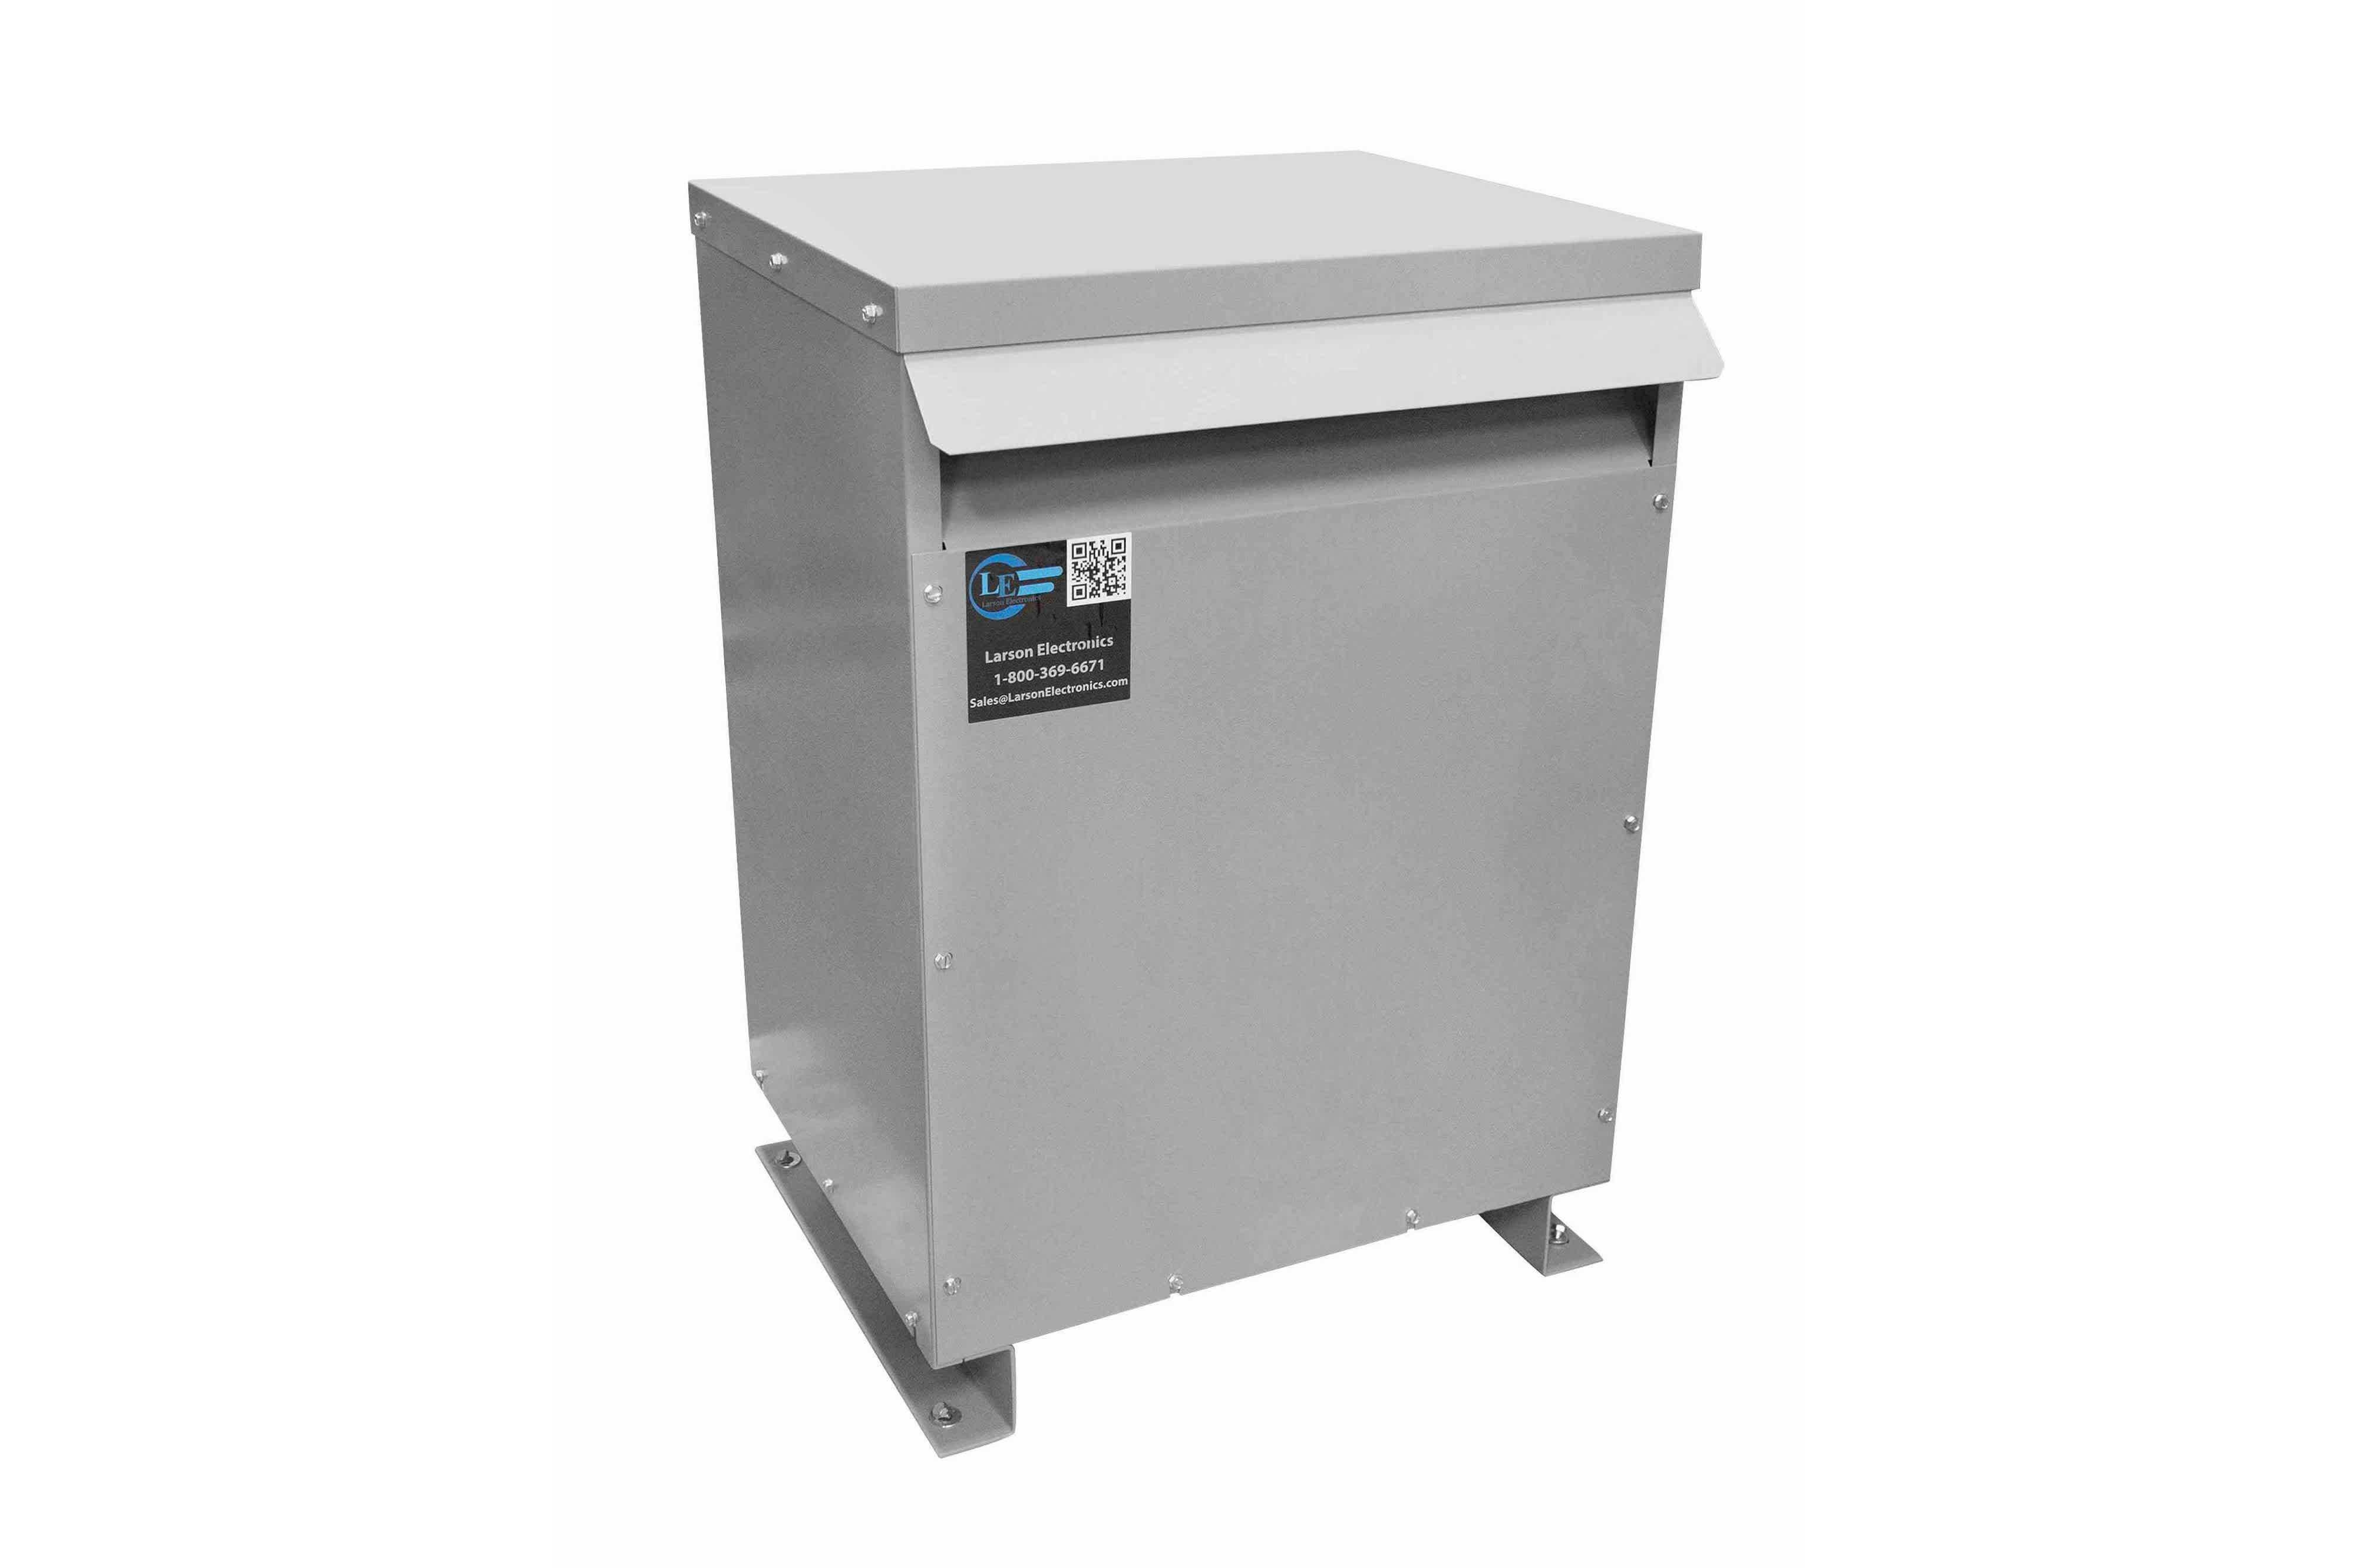 125 kVA 3PH Isolation Transformer, 480V Wye Primary, 400Y/231 Wye-N Secondary, N3R, Ventilated, 60 Hz